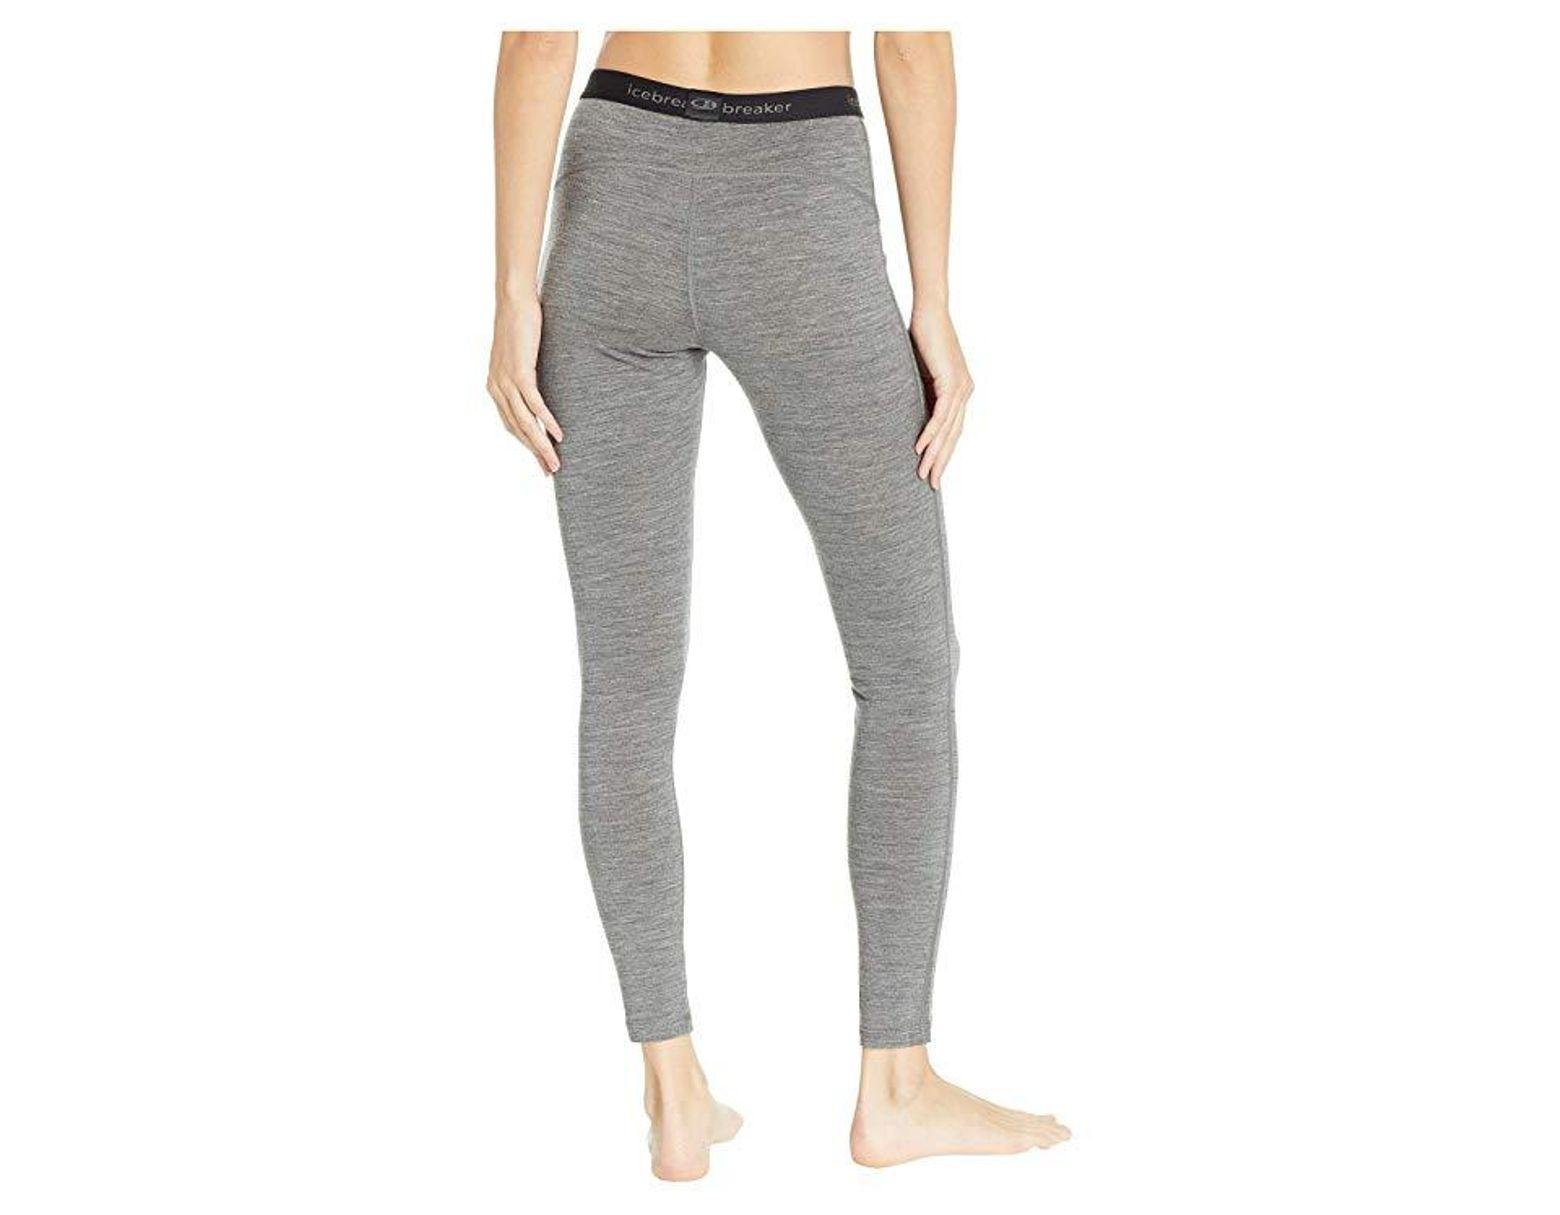 b2aabe816f6 Icebreaker 200 Oasis Merino Base Layer Leggings (gritstone Heather) Casual Pants  in Gray - Lyst